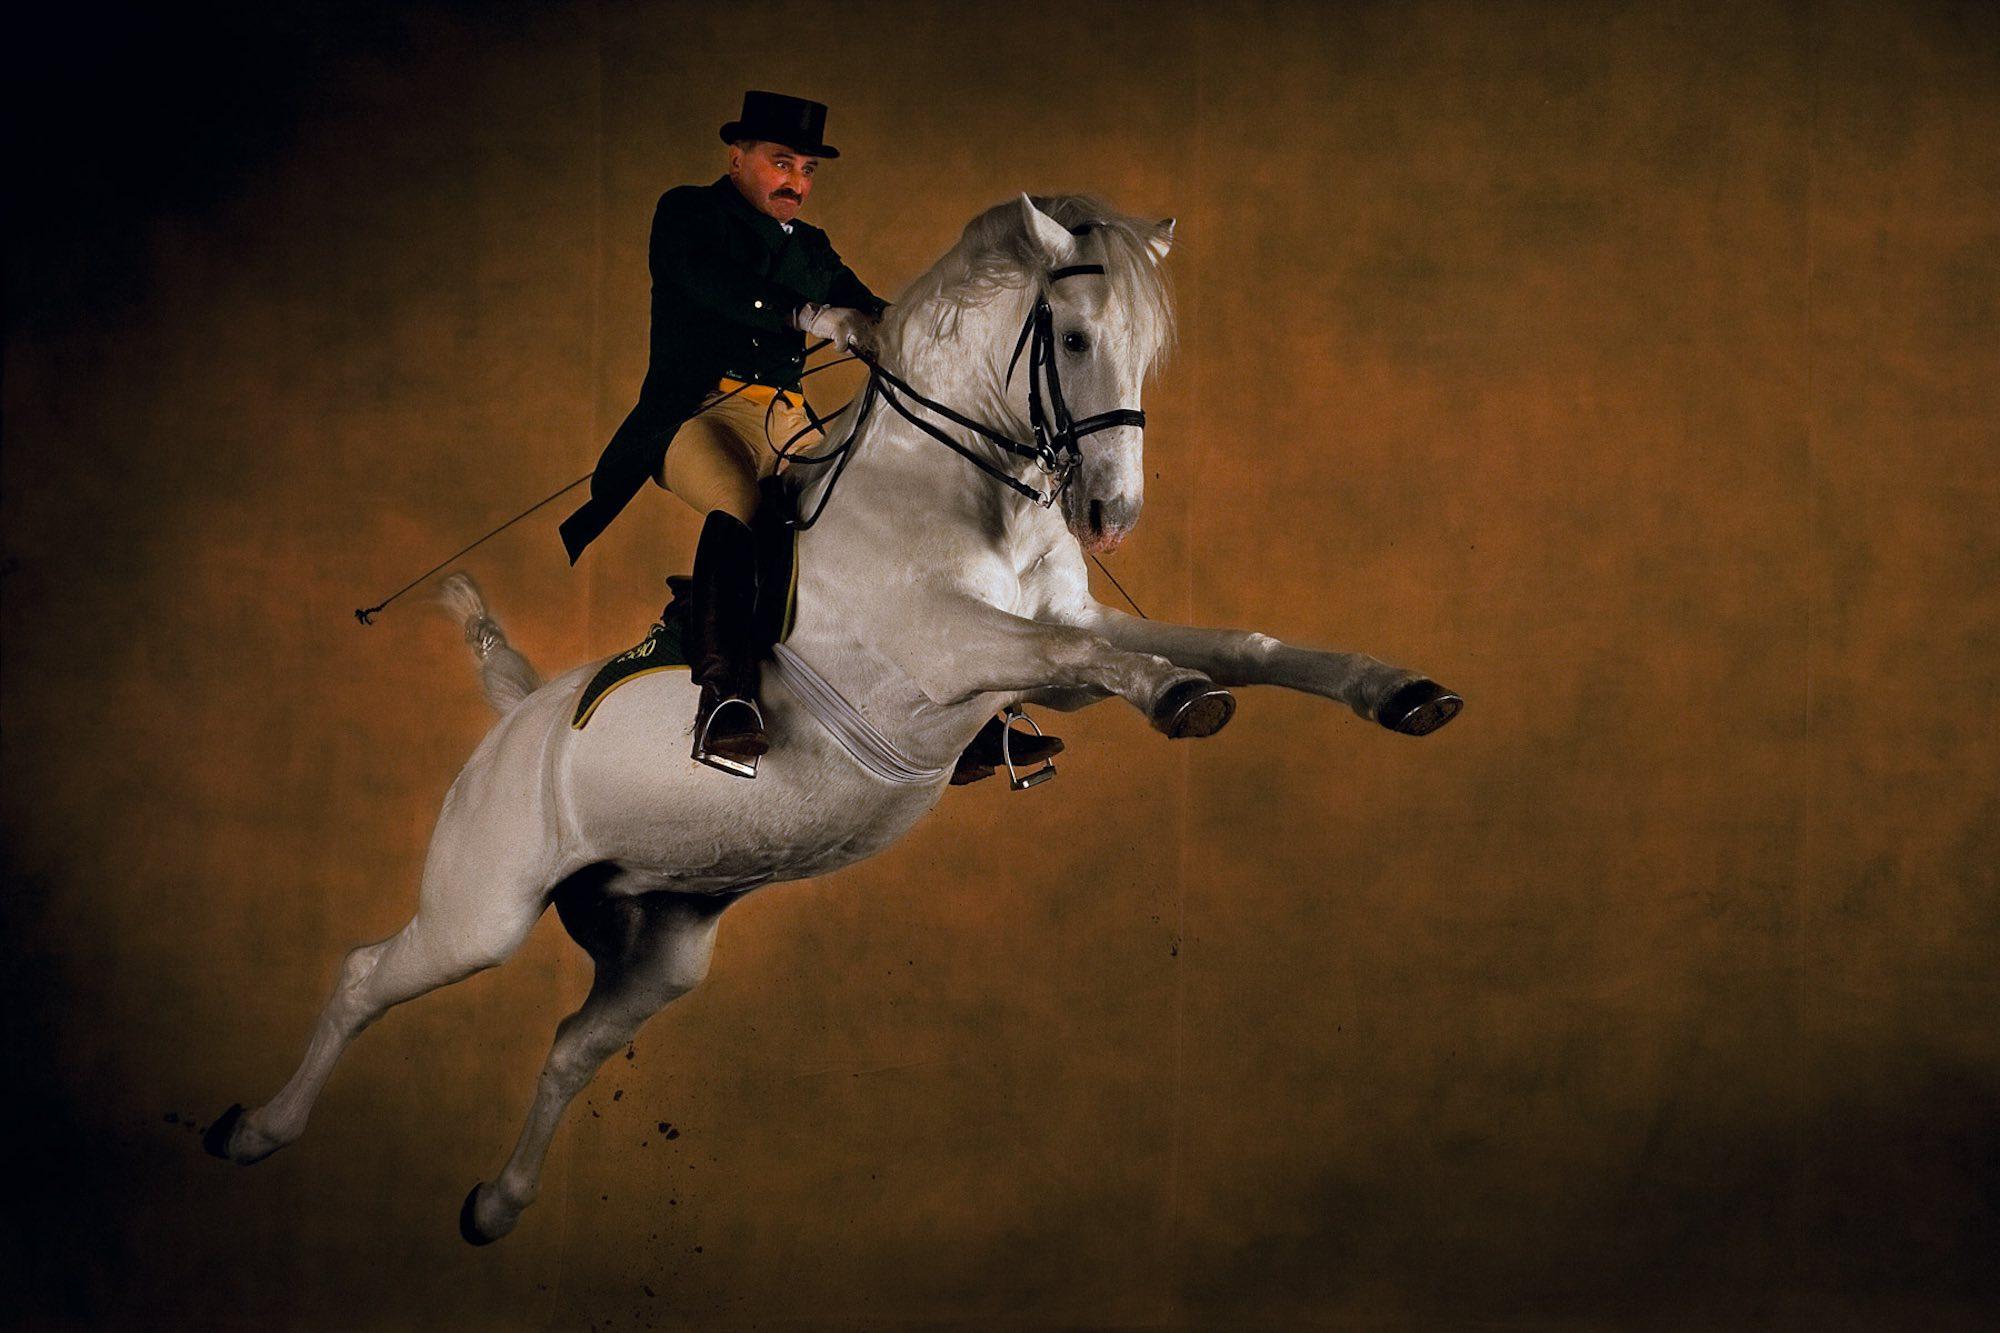 Lipizzaner stallion - Yann Arthus-Bertrand